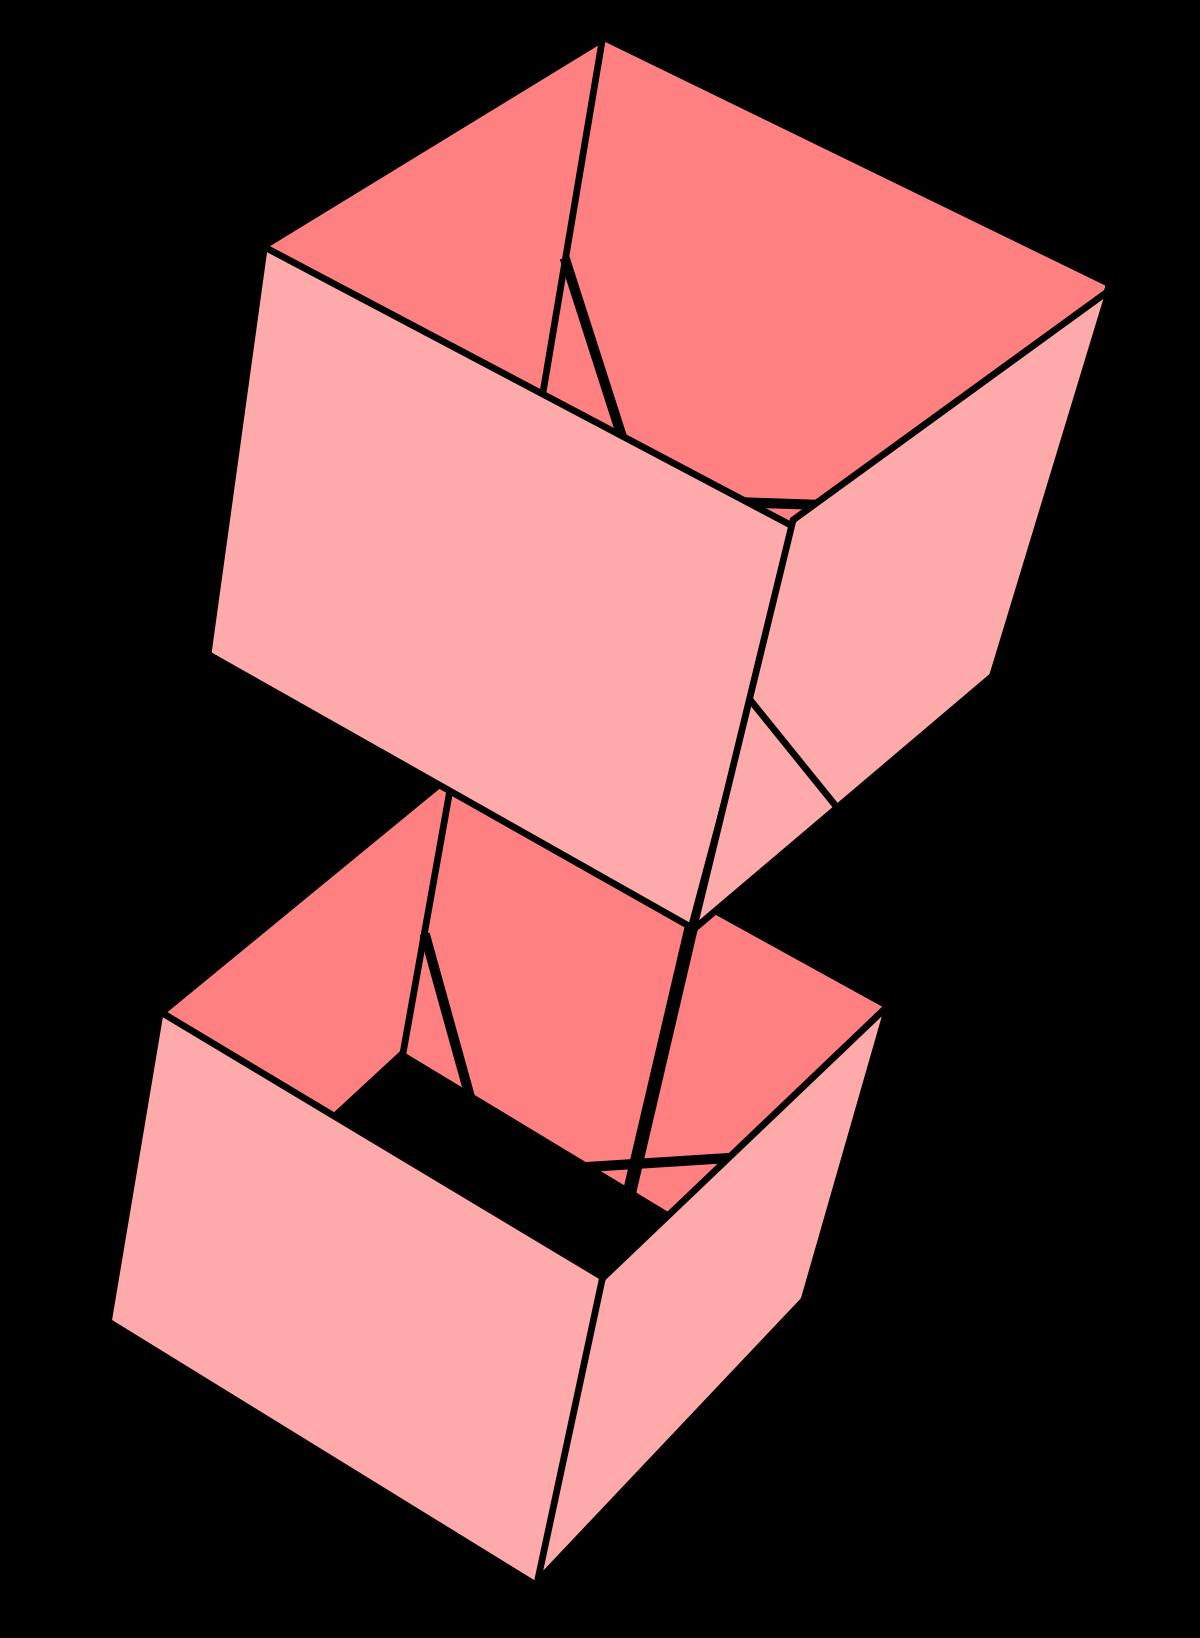 Clipart box rectangular box. Kite wikipedia